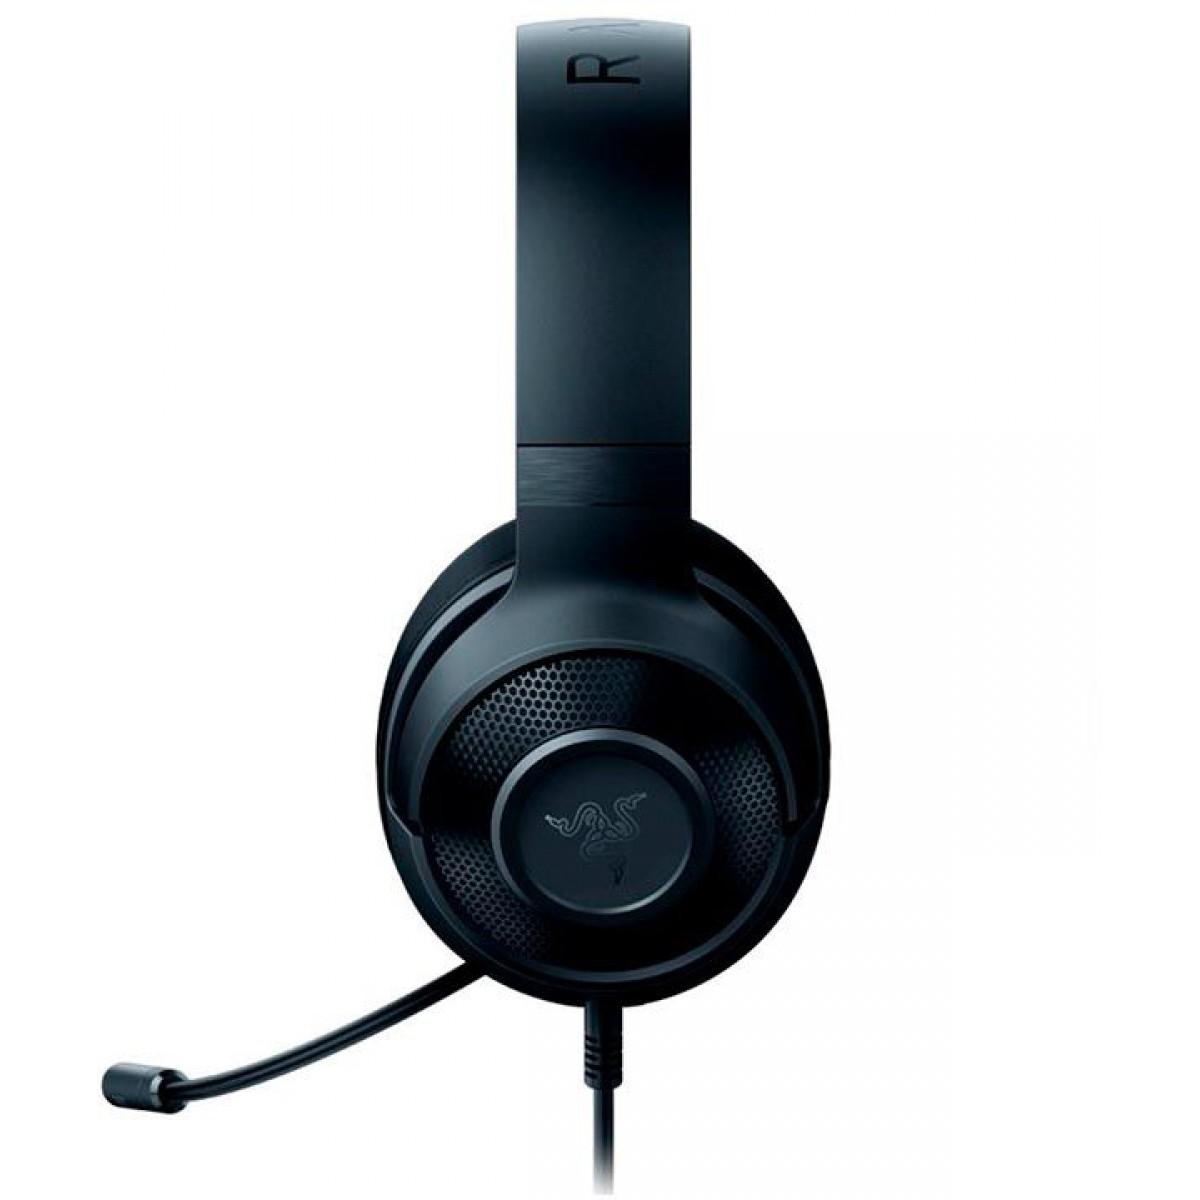 Headset Gamer Razer Kraken X Lite Essential, Audio 7.1, Black